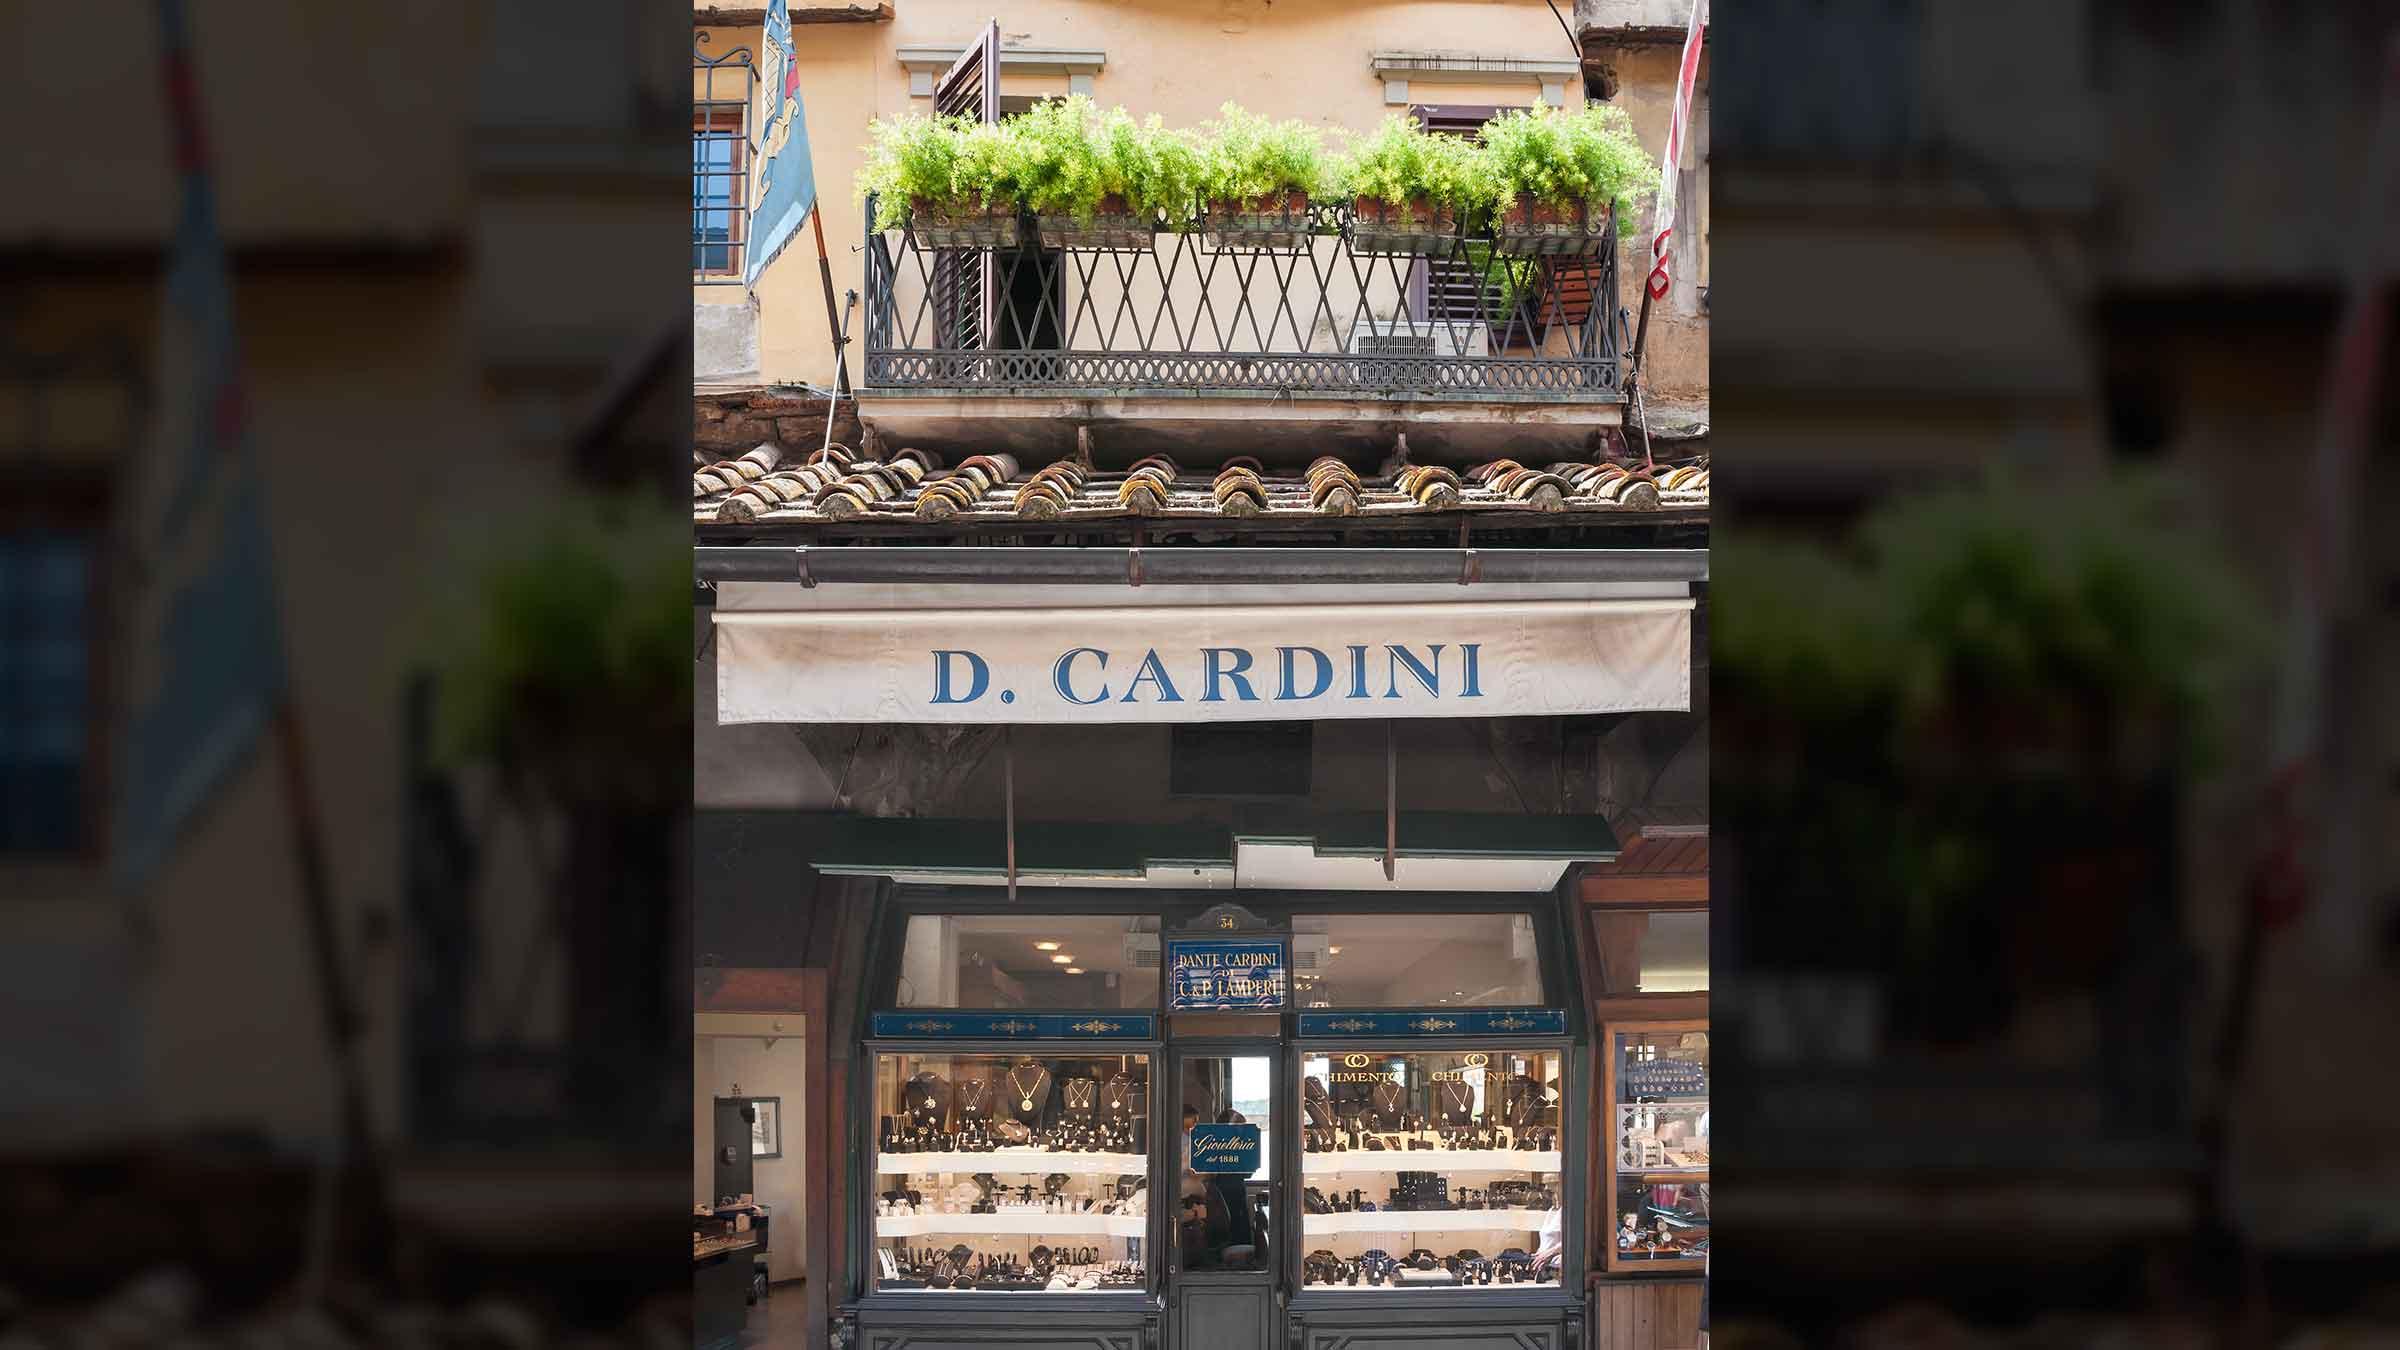 Dante Cardini